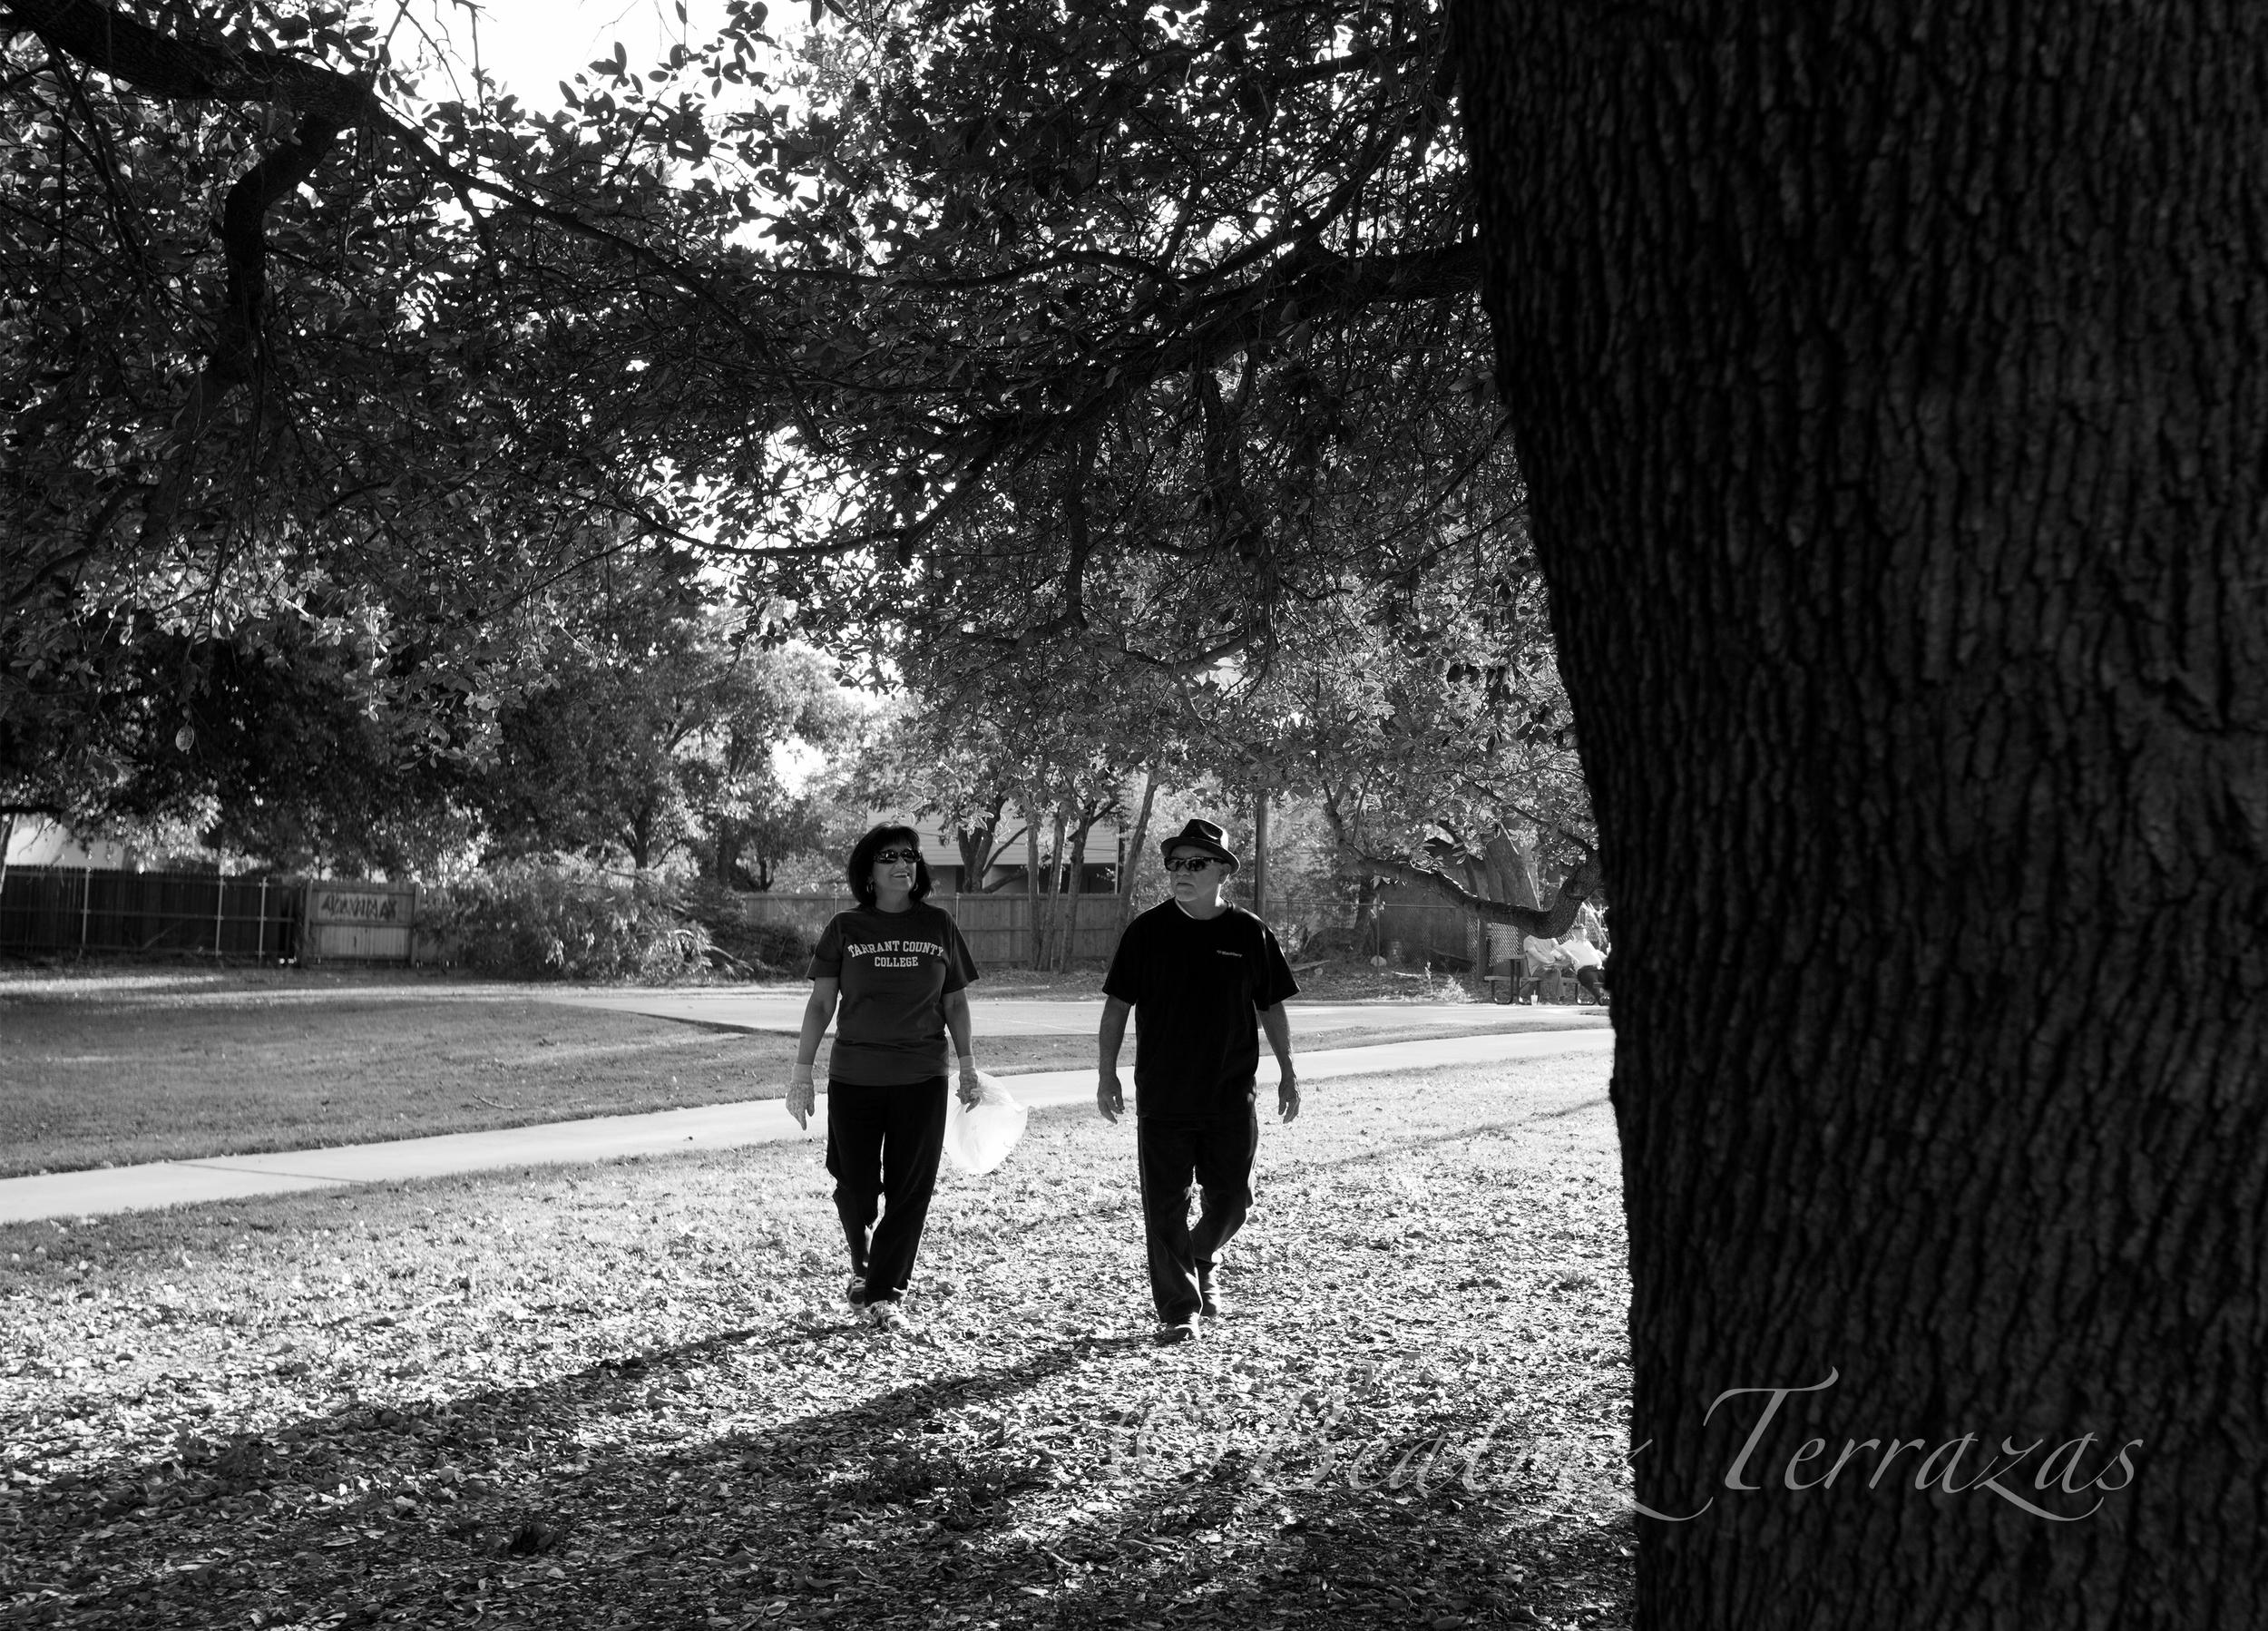 Eva and her husband Bob walk through Linwood - Jesse Sandoval Park periodically to pick up trash.